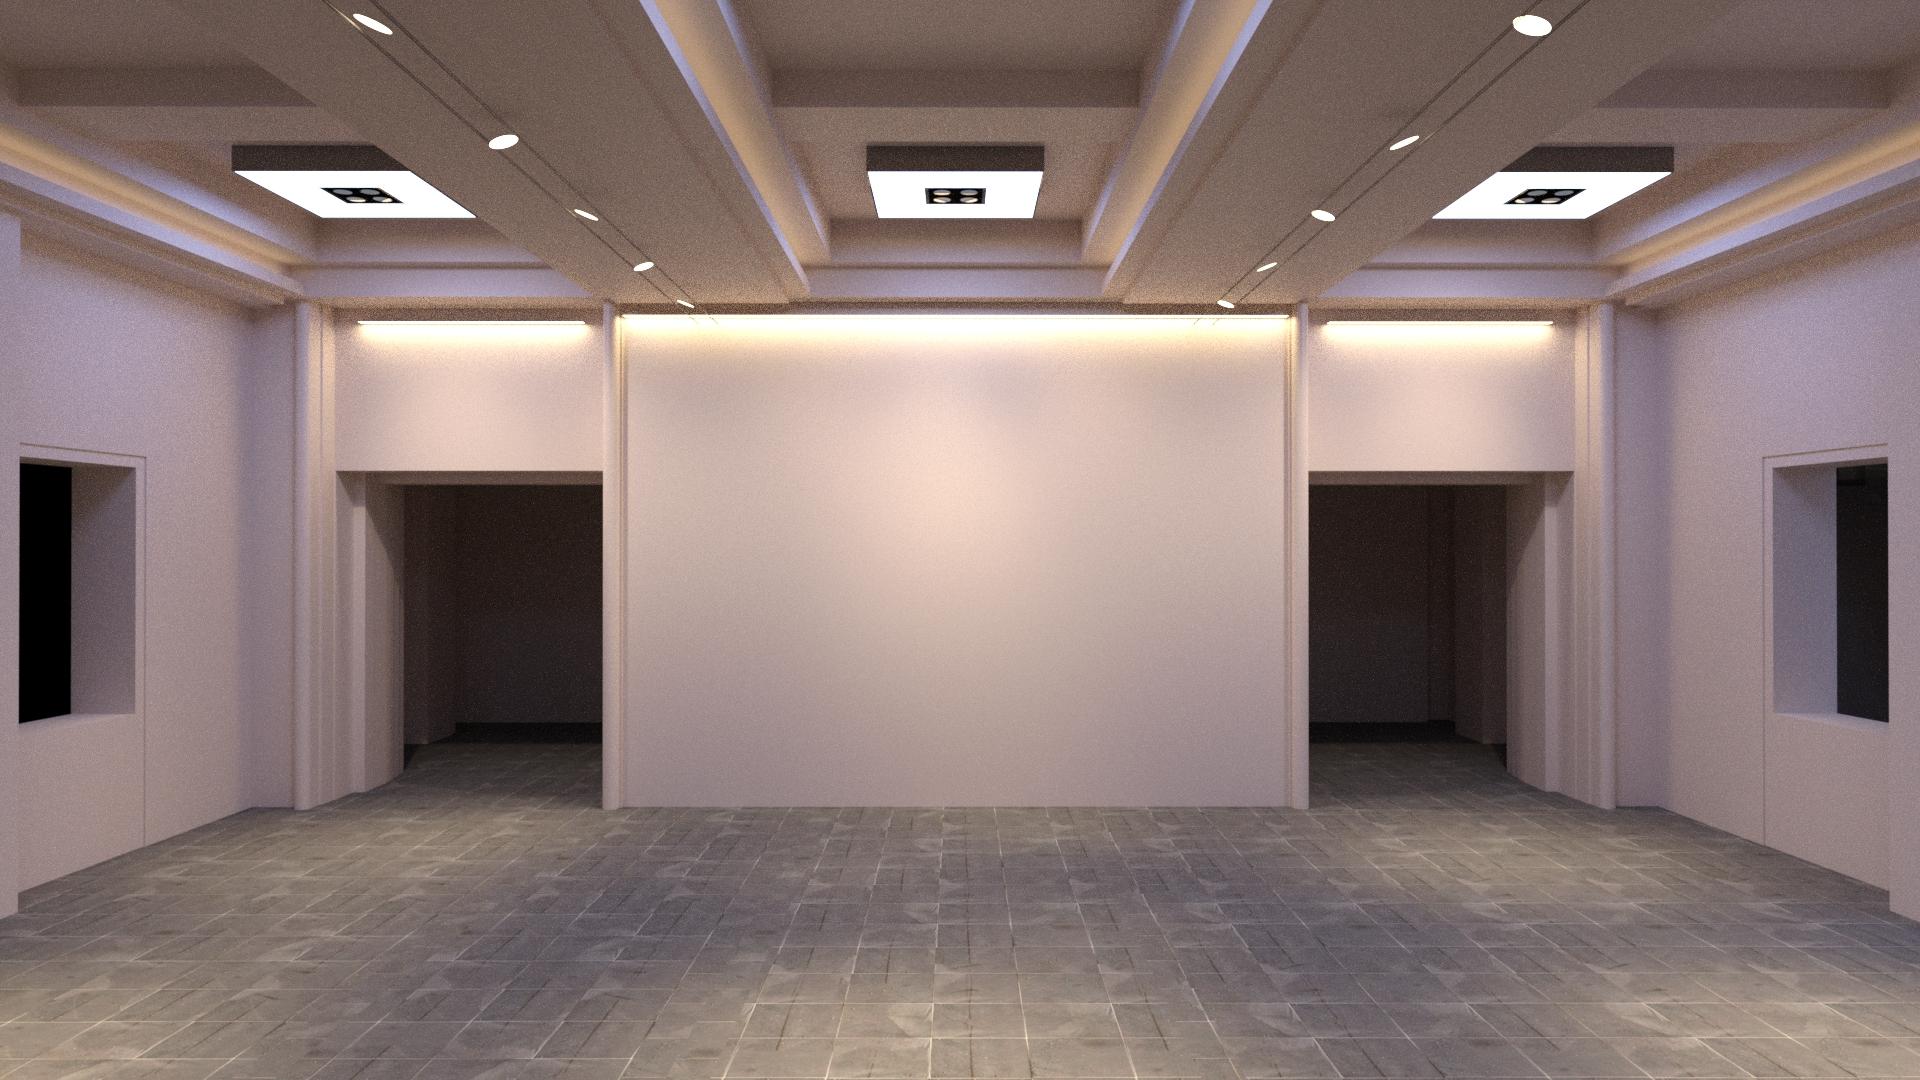 Wall wash option u on light design services